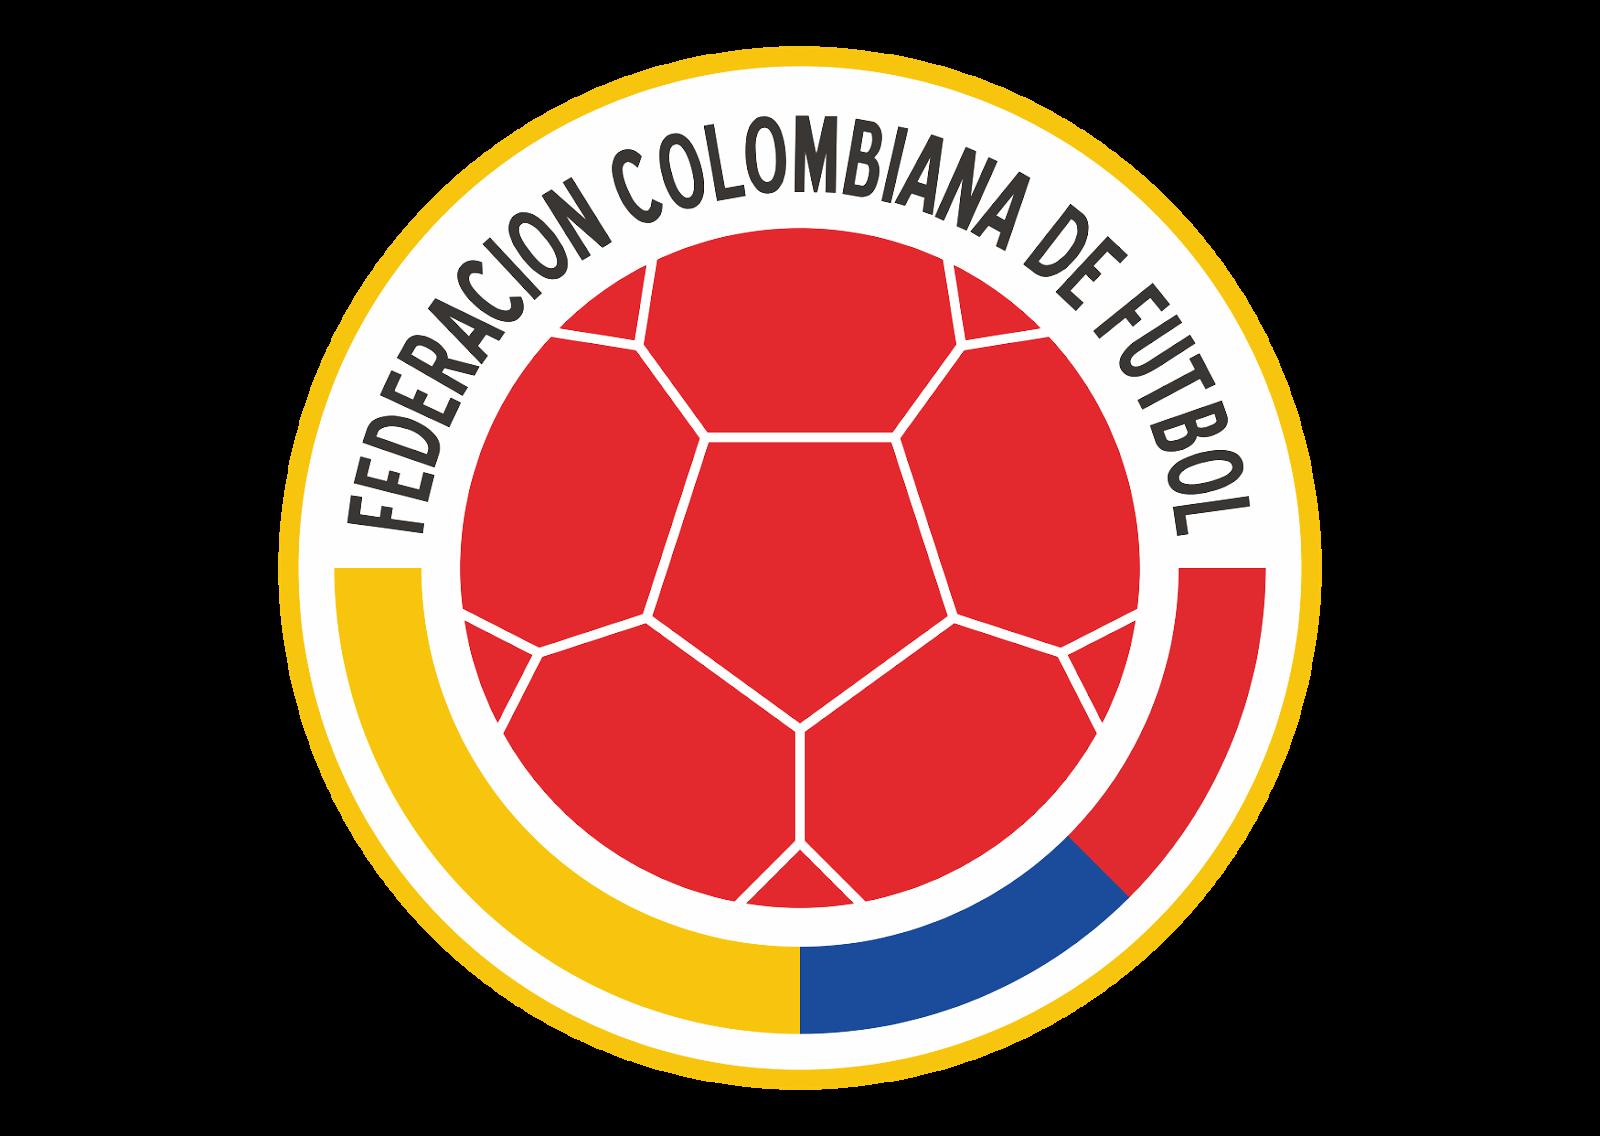 CLUBES DEL FUTBOL PROFESIONAL COLOMBIANO 2018 - Imagenes De Escudos De Futbol Colombiano